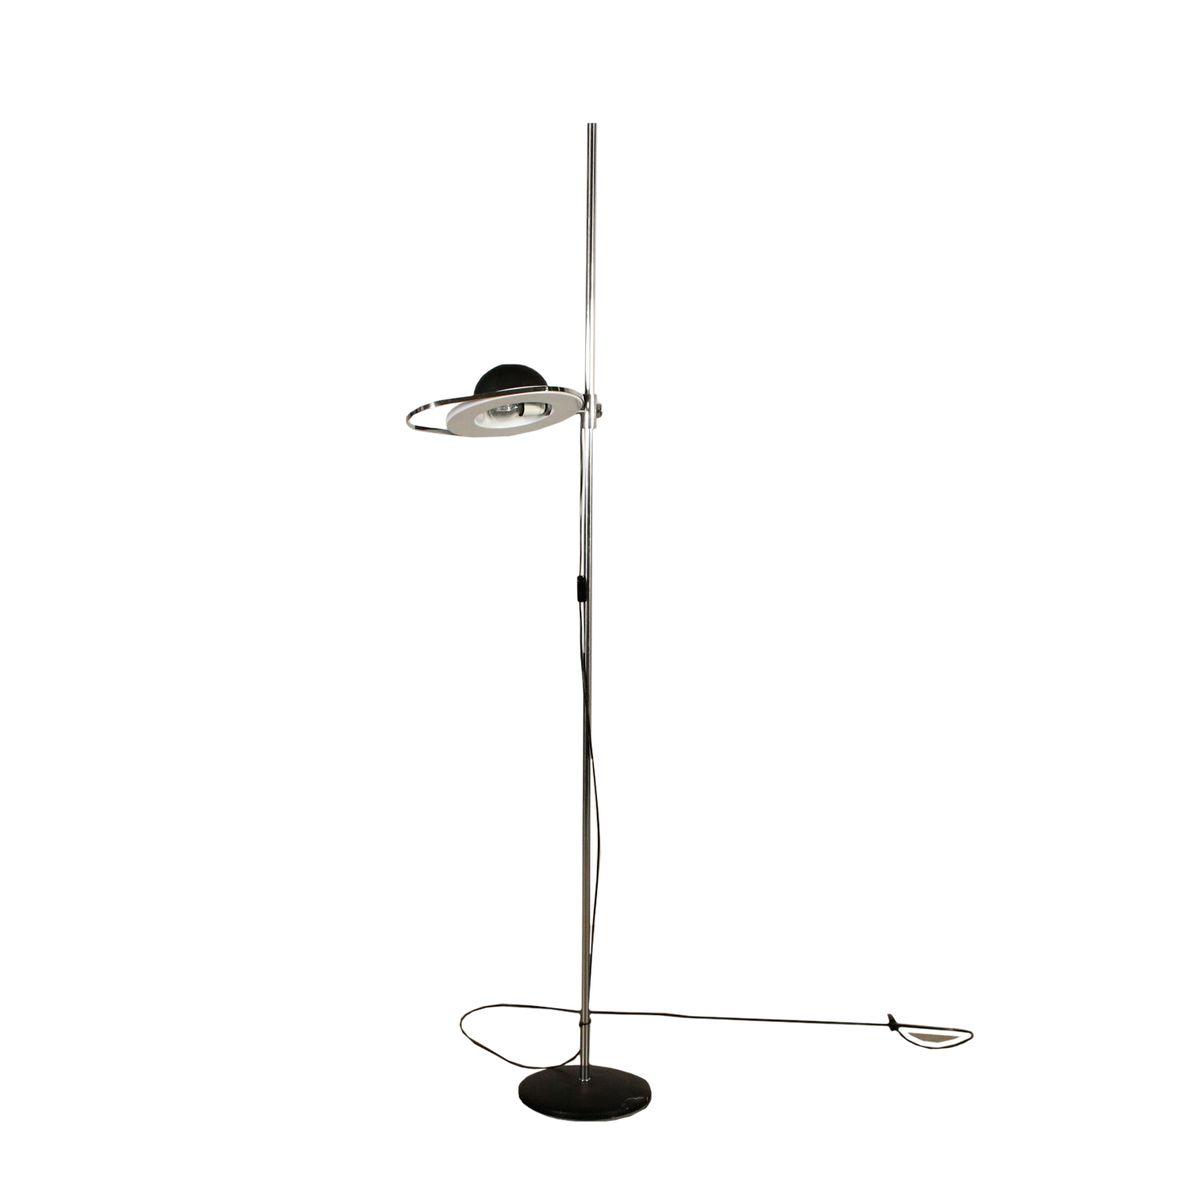 Vintage Lacquered Aluminium & Chromed Metal Floor Lamp, 1960s